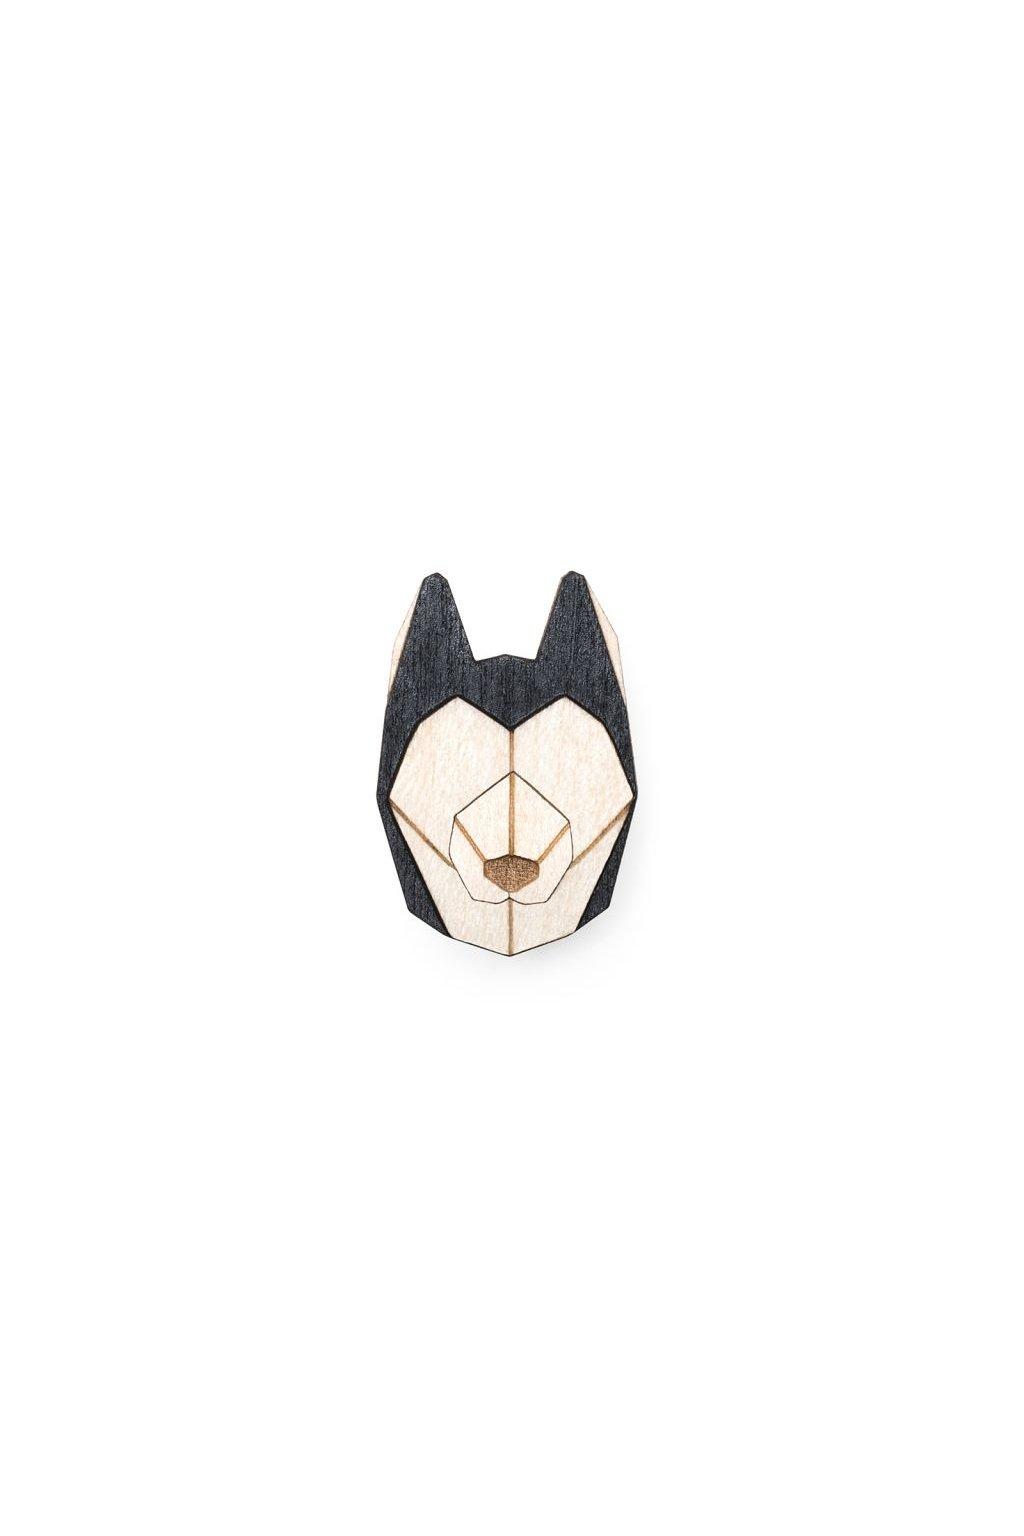 0 husky brooch cover